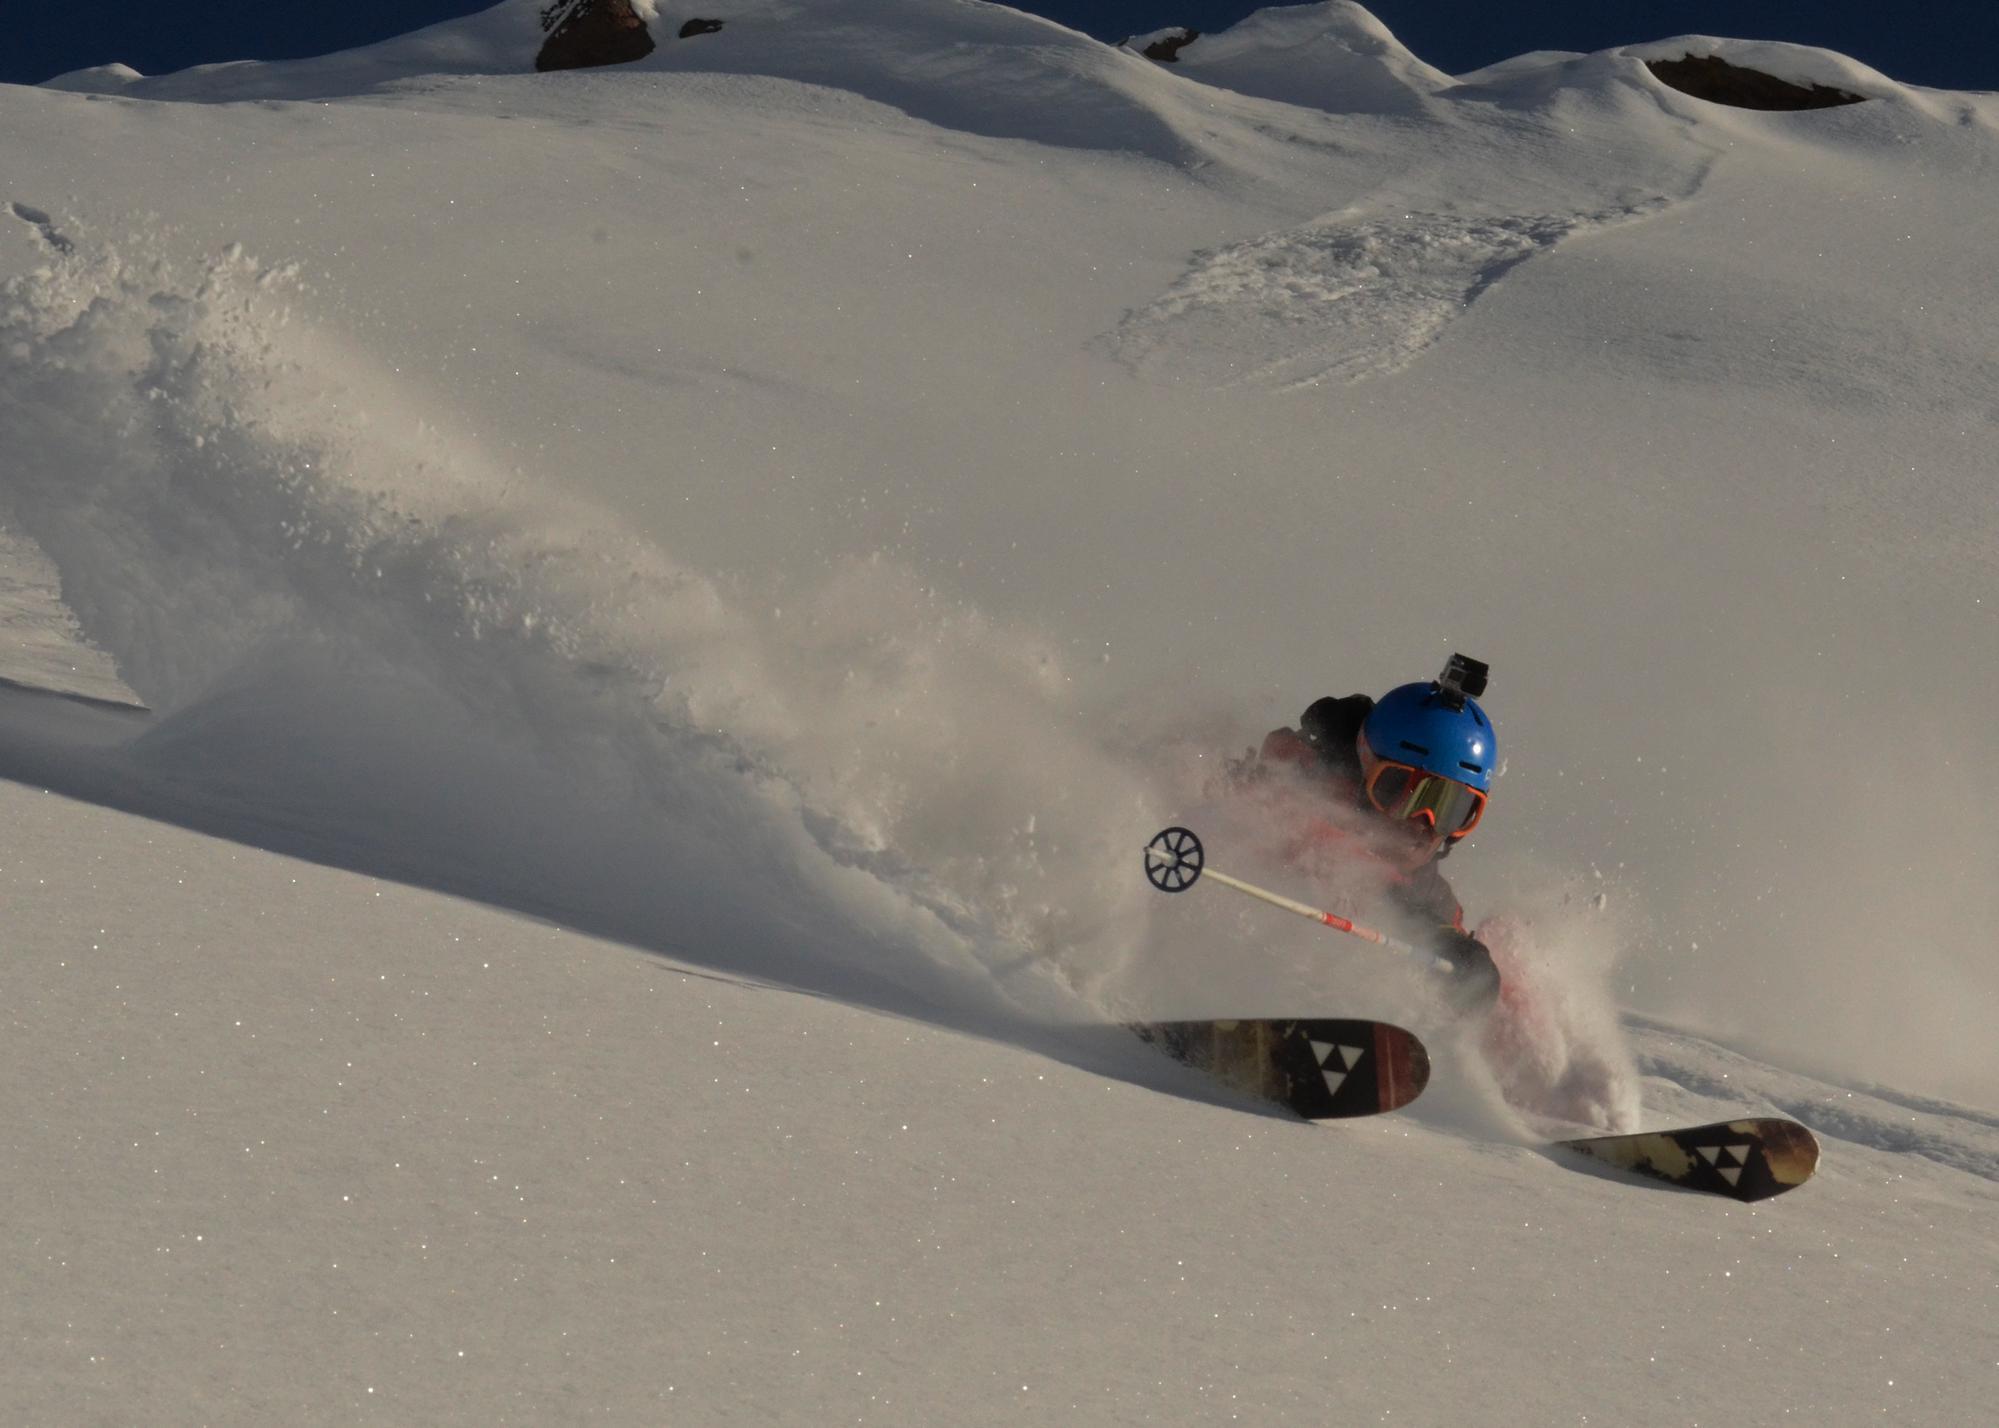 RYT Coach Niccolò Zarattini riding in the Chilean deep powder - Ph. Tom Winter